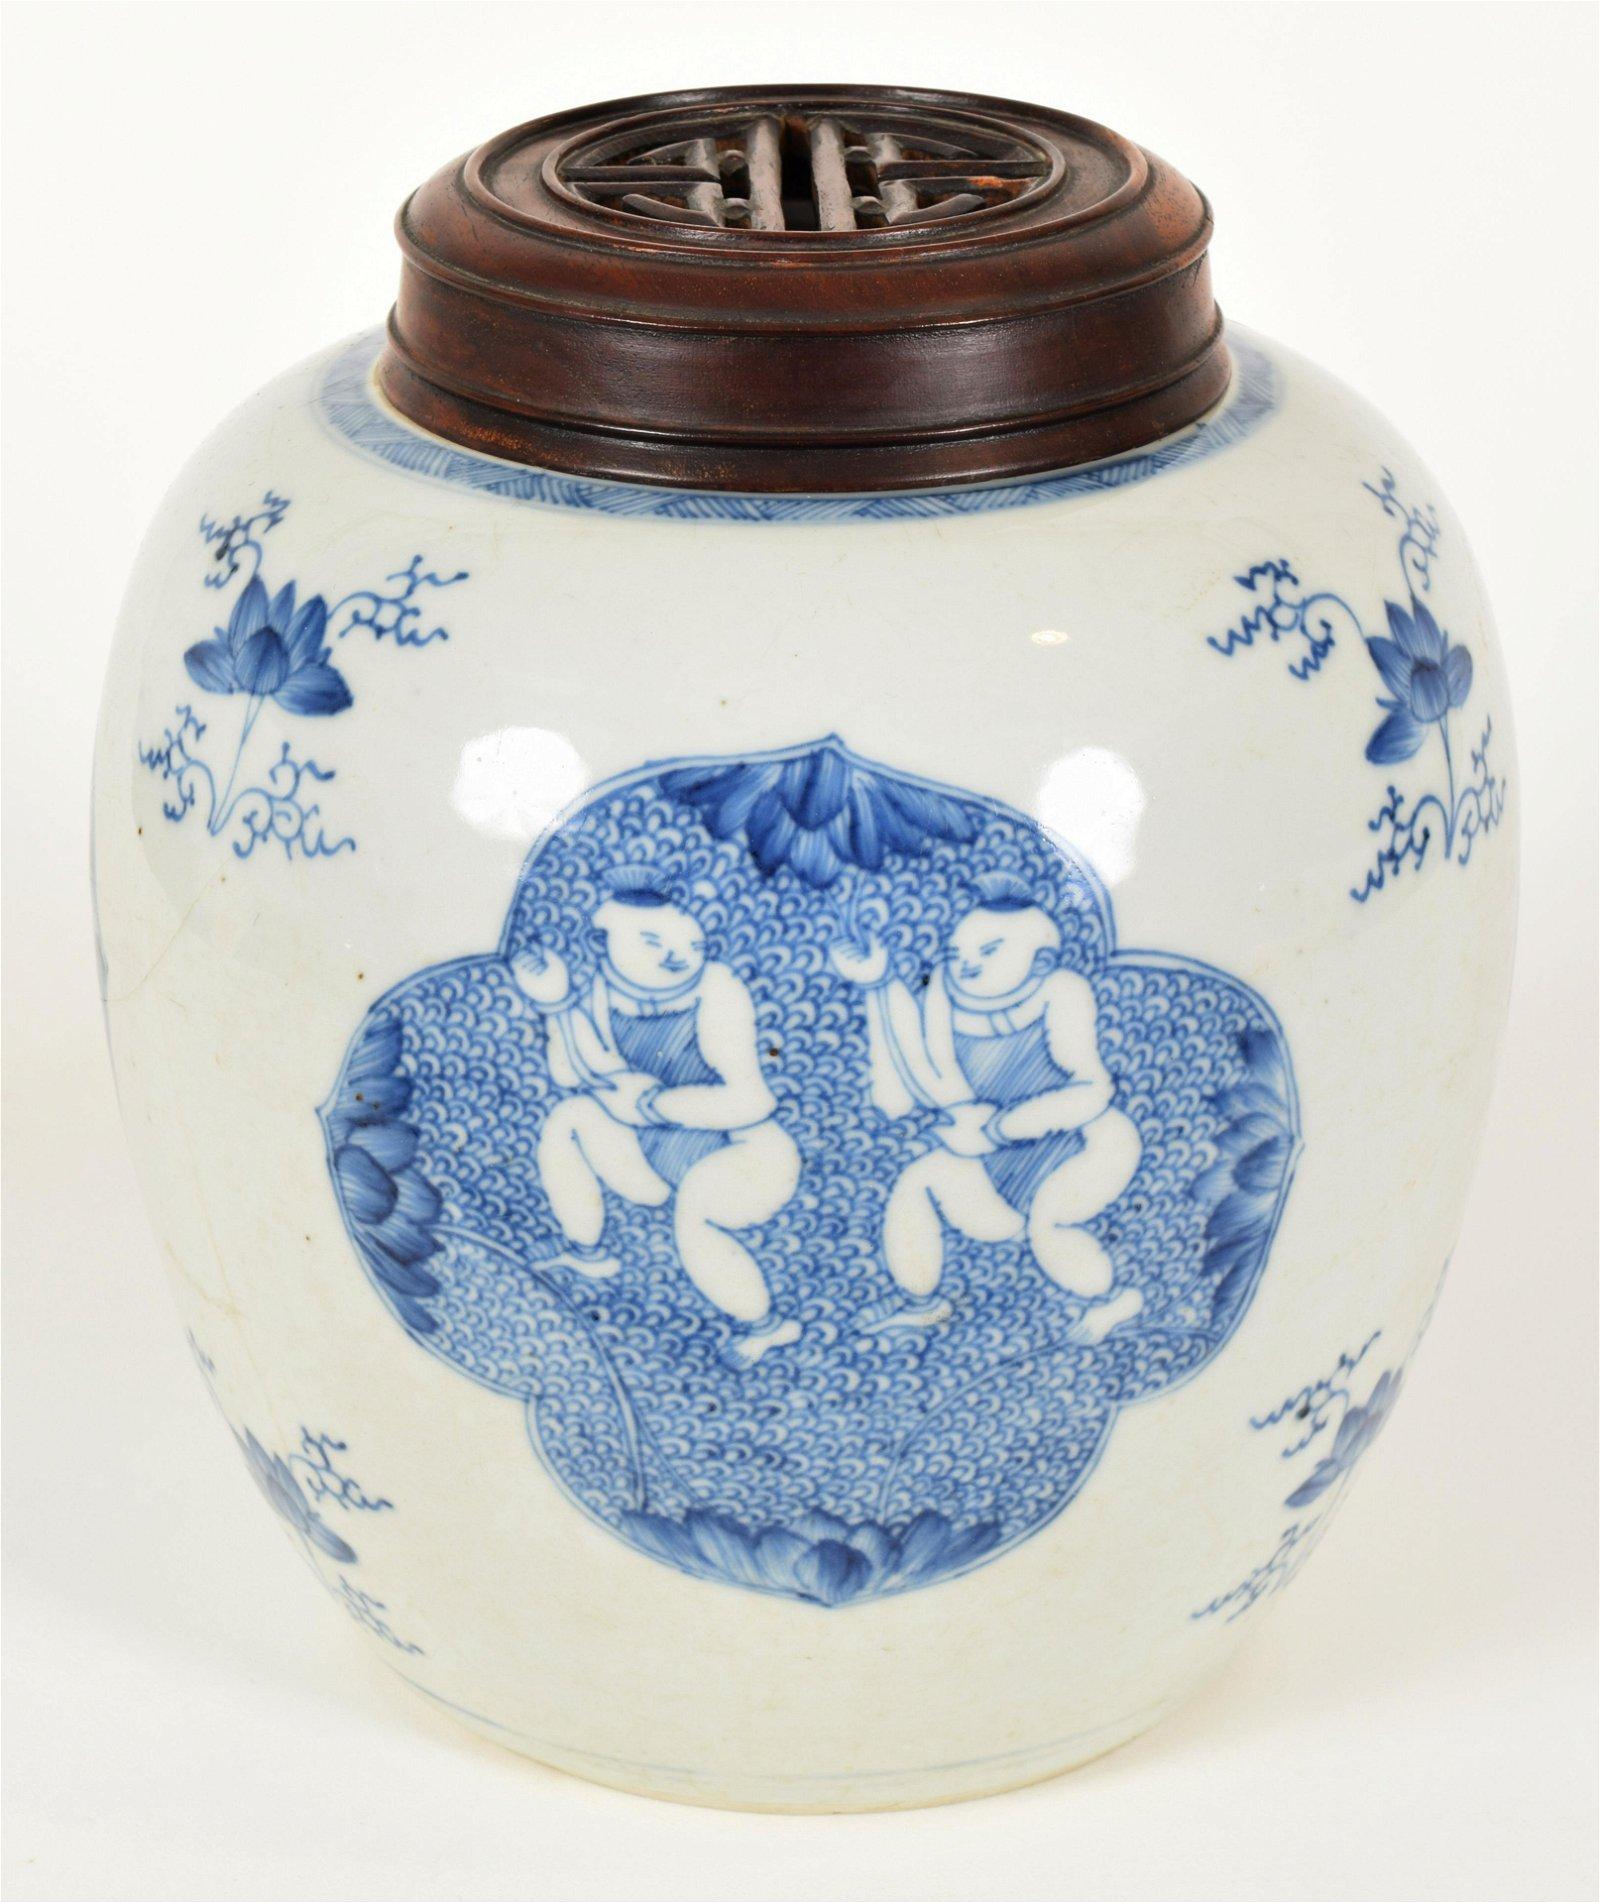 Oviform Porcelain Jar, 19th Century